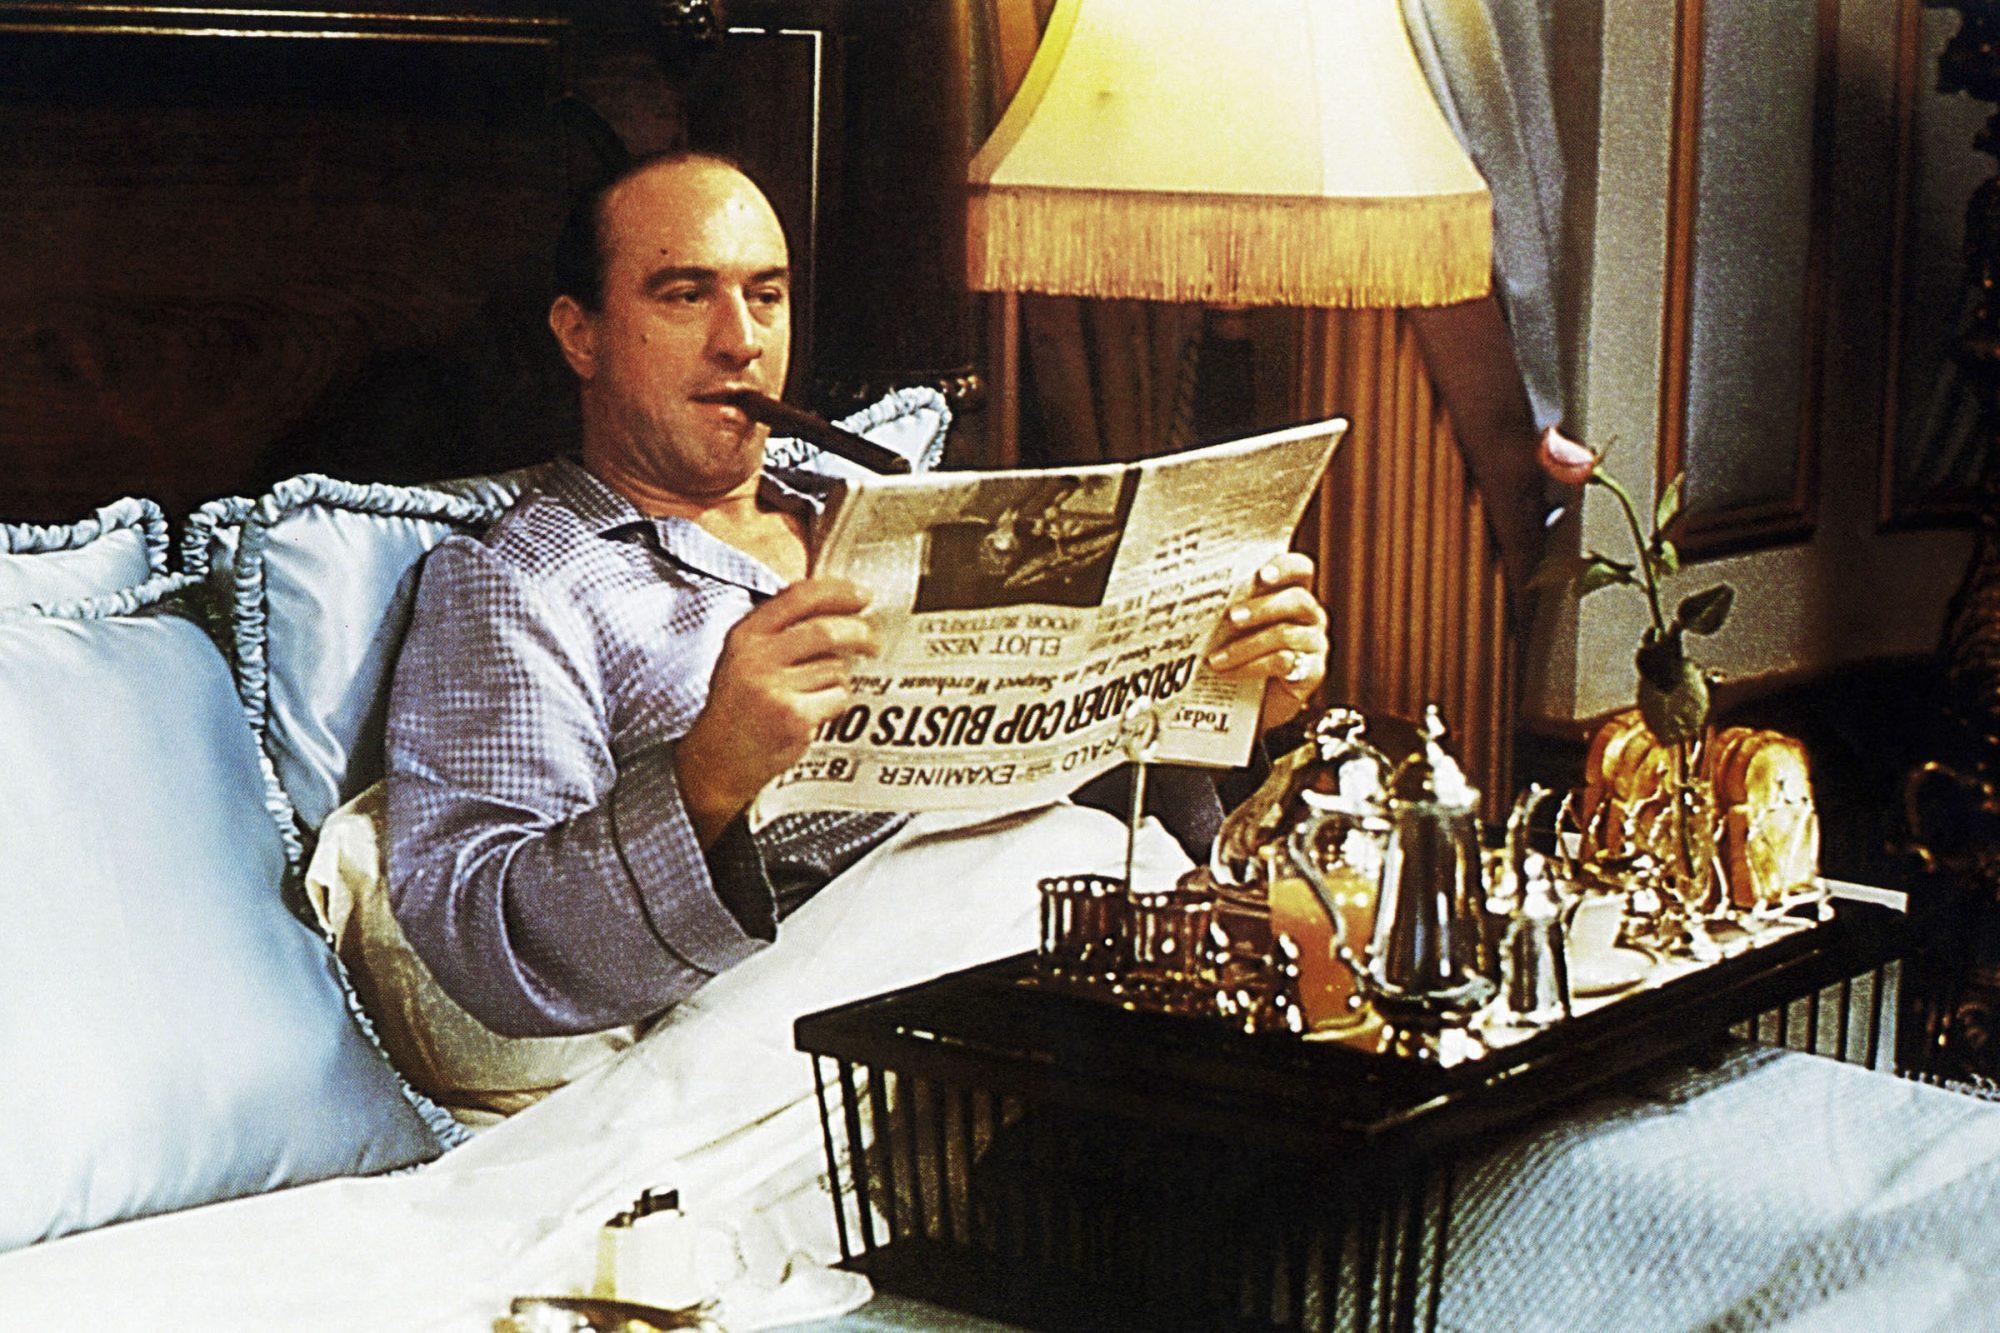 THE UNTOUCHABLES, Robert De Niro as Al Capone, 1987, © Paramount/courtesy Everett Collection